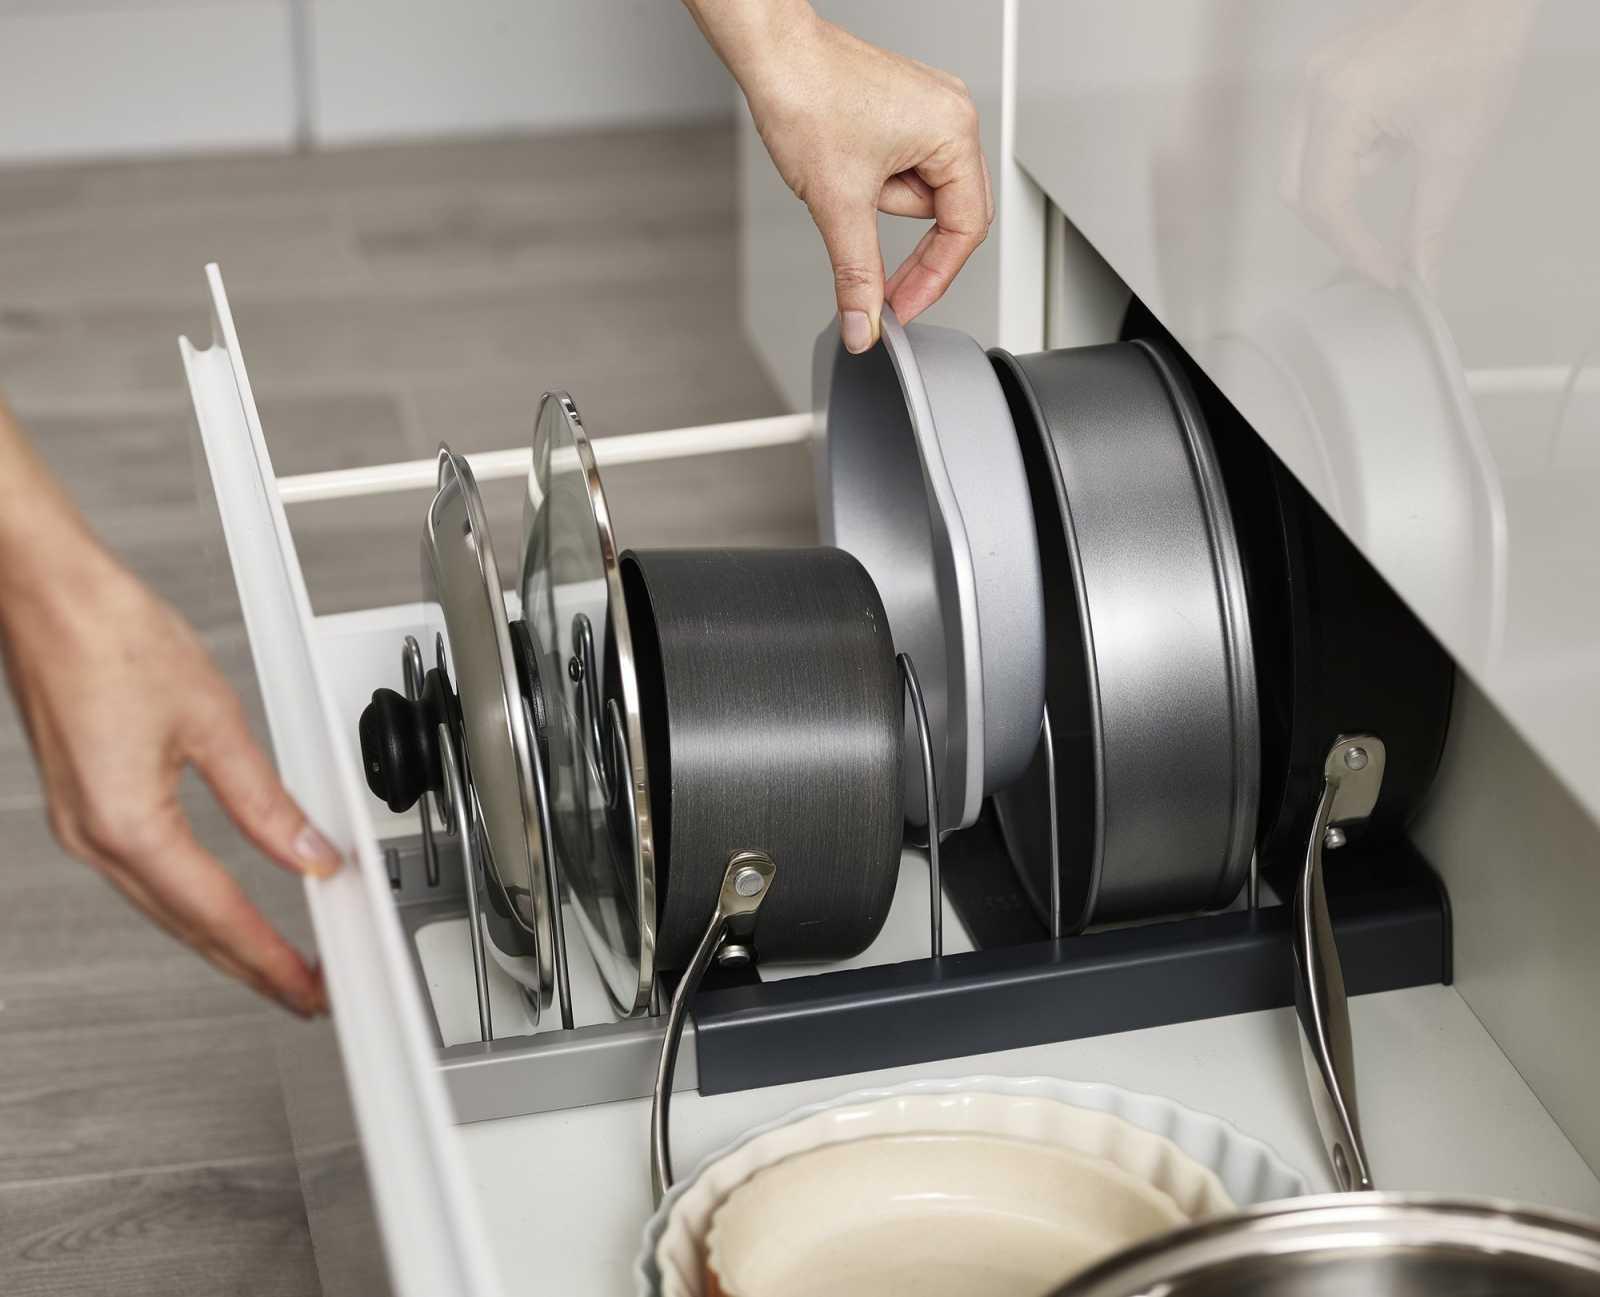 Органайзер для сушки посуды раскладной Joseph Joseph DRAWERSTORE, серый Joseph Joseph 85167 фото 1